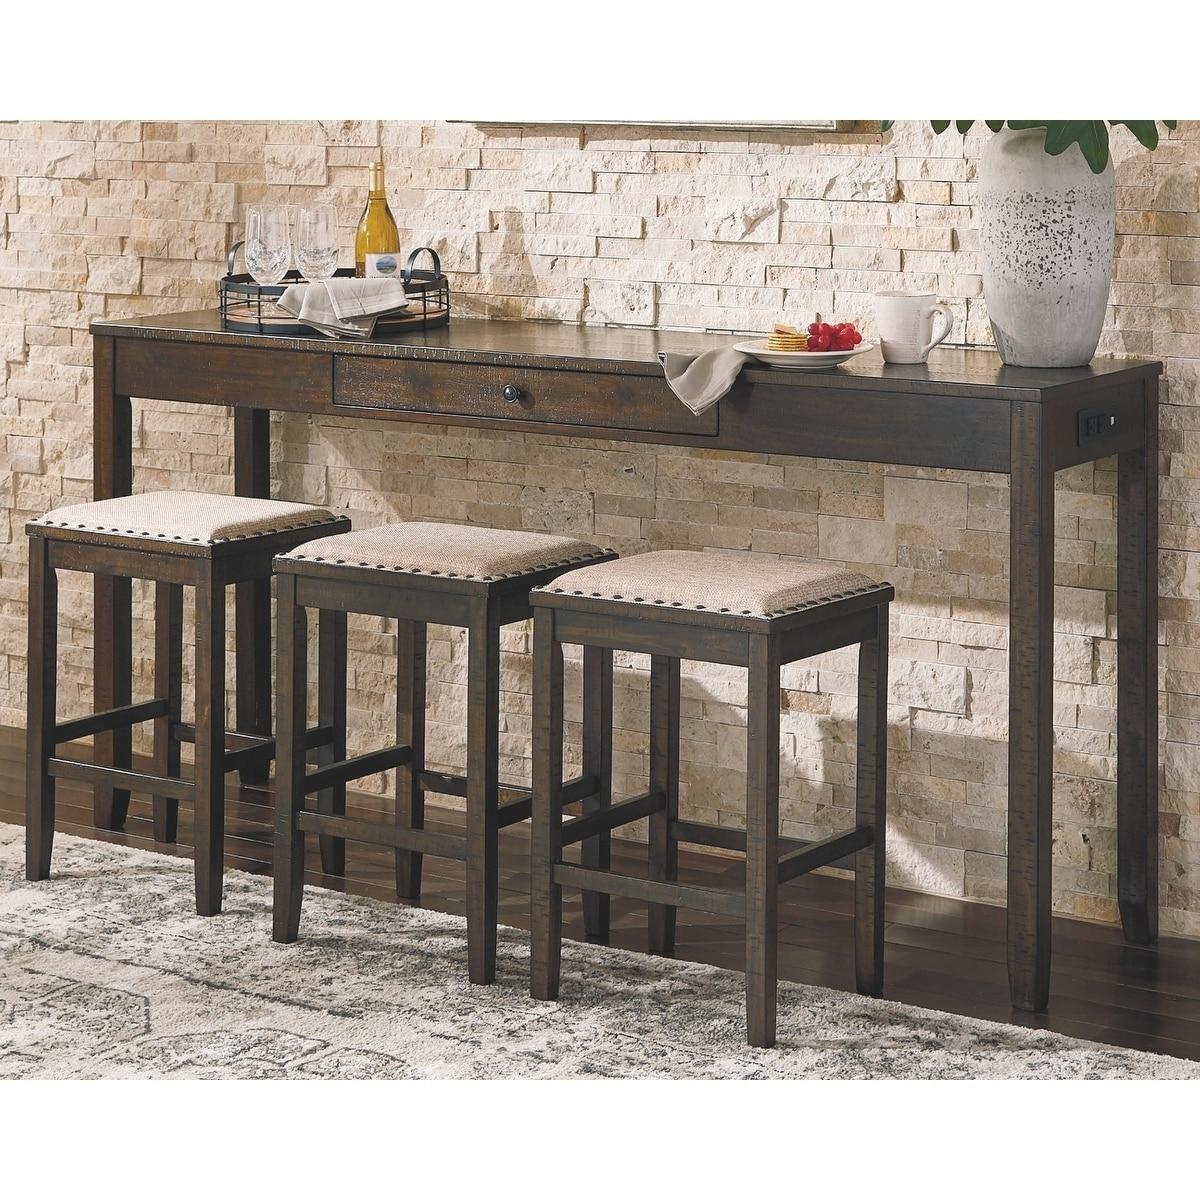 The Gray Barn Yewbank Rectangular 9 piece Counter Height Dining Set